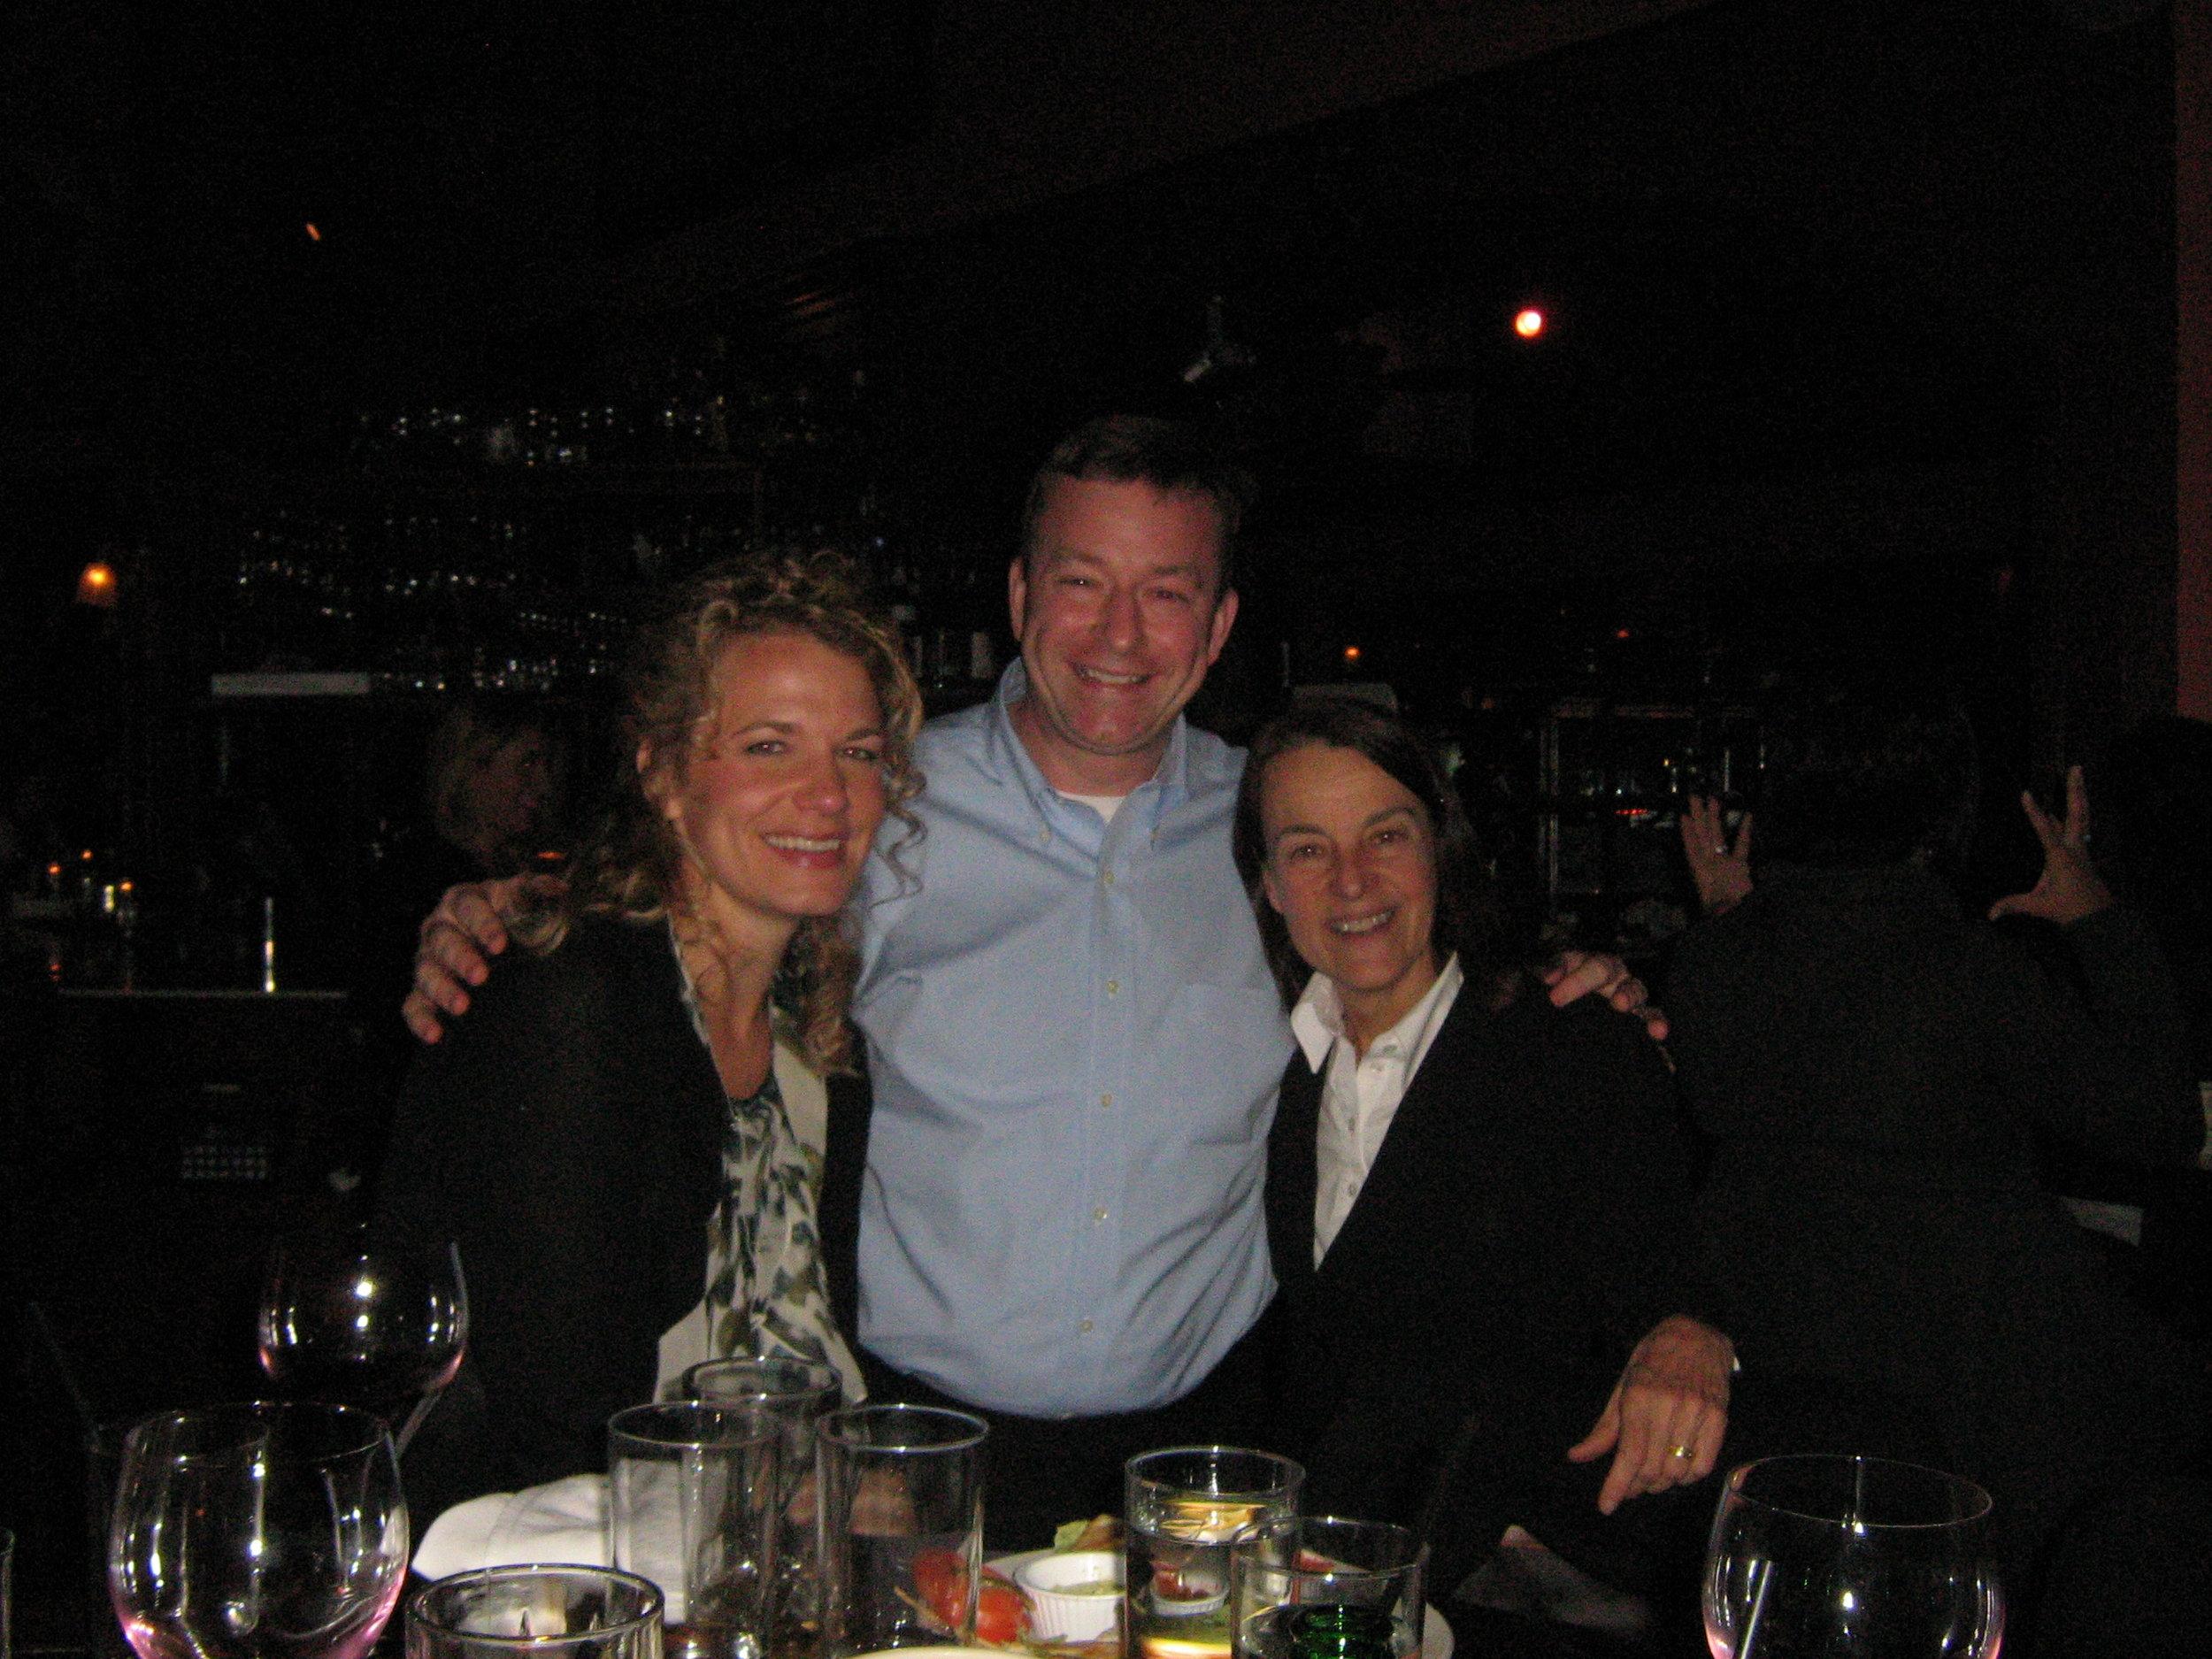 Cynthia Watters and Libby Larsen 2010.JPG